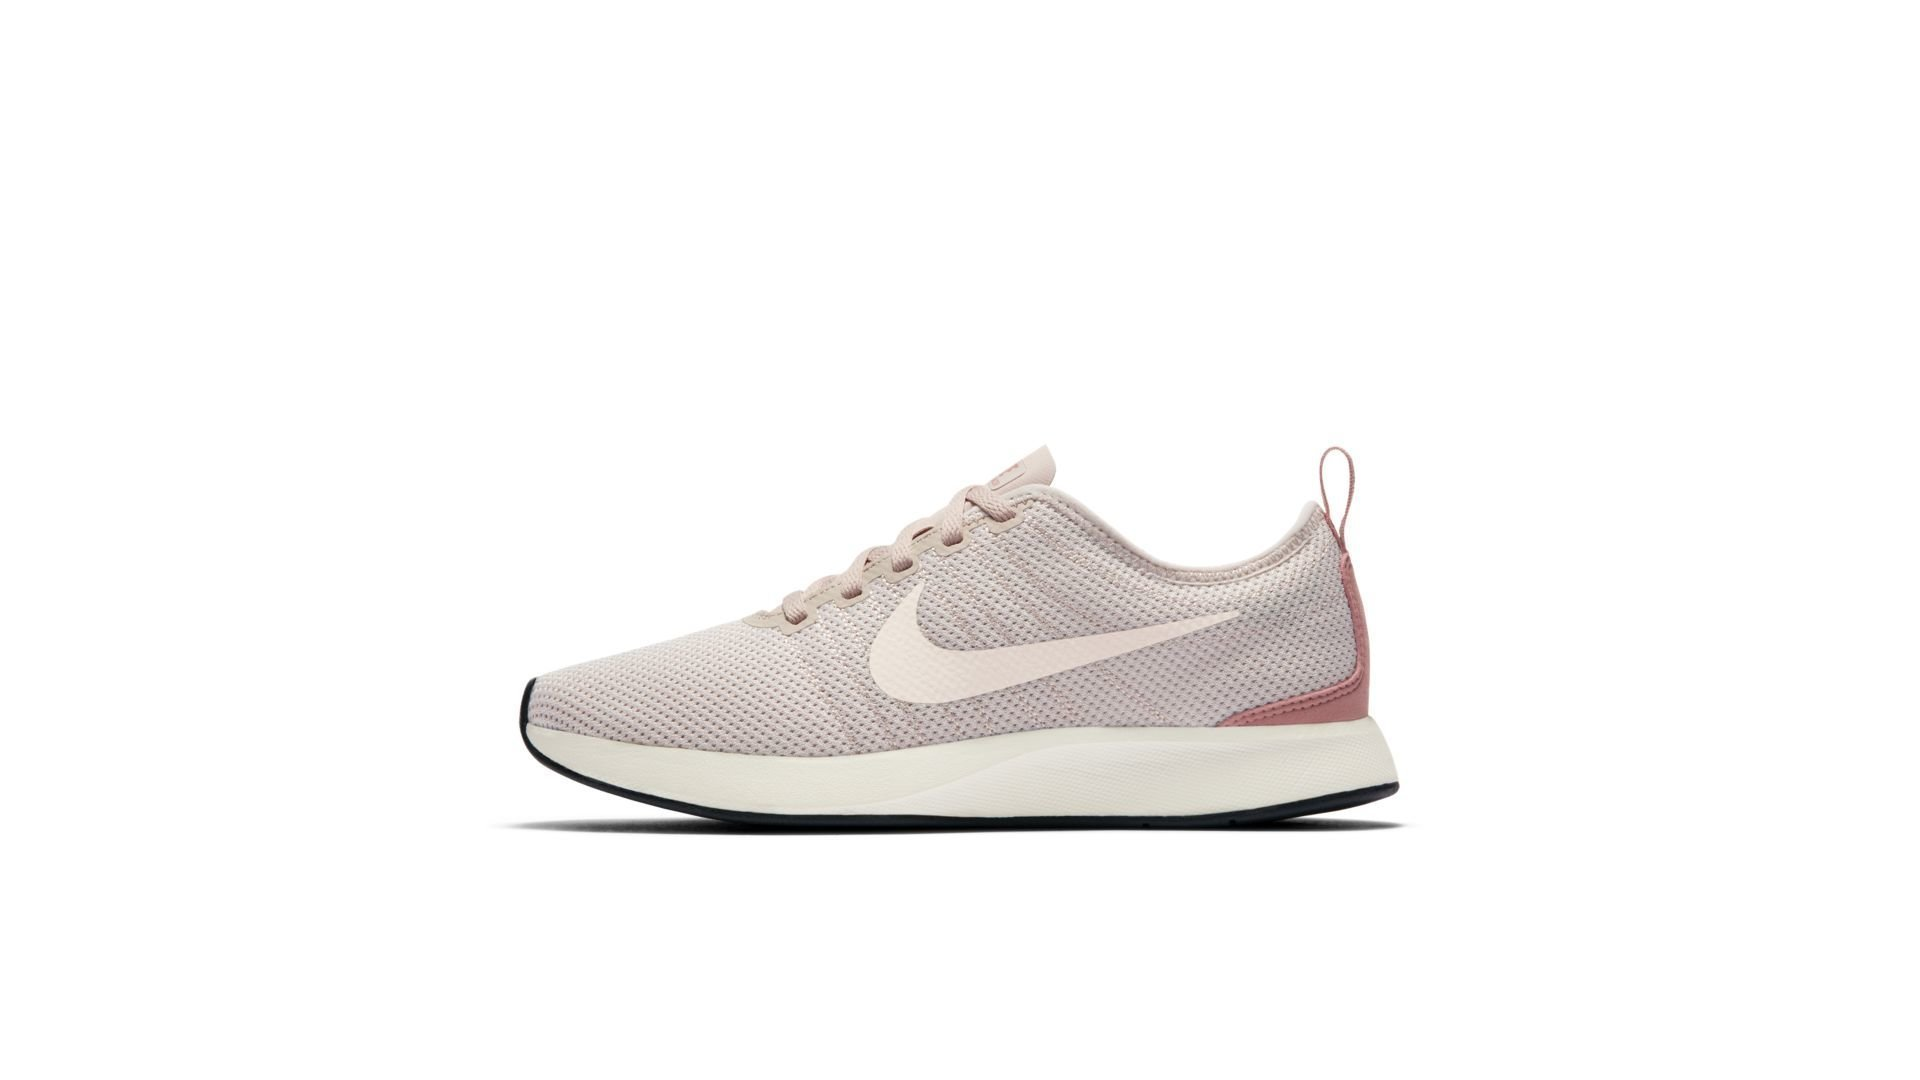 Nike Dualtone Racer 917682-601